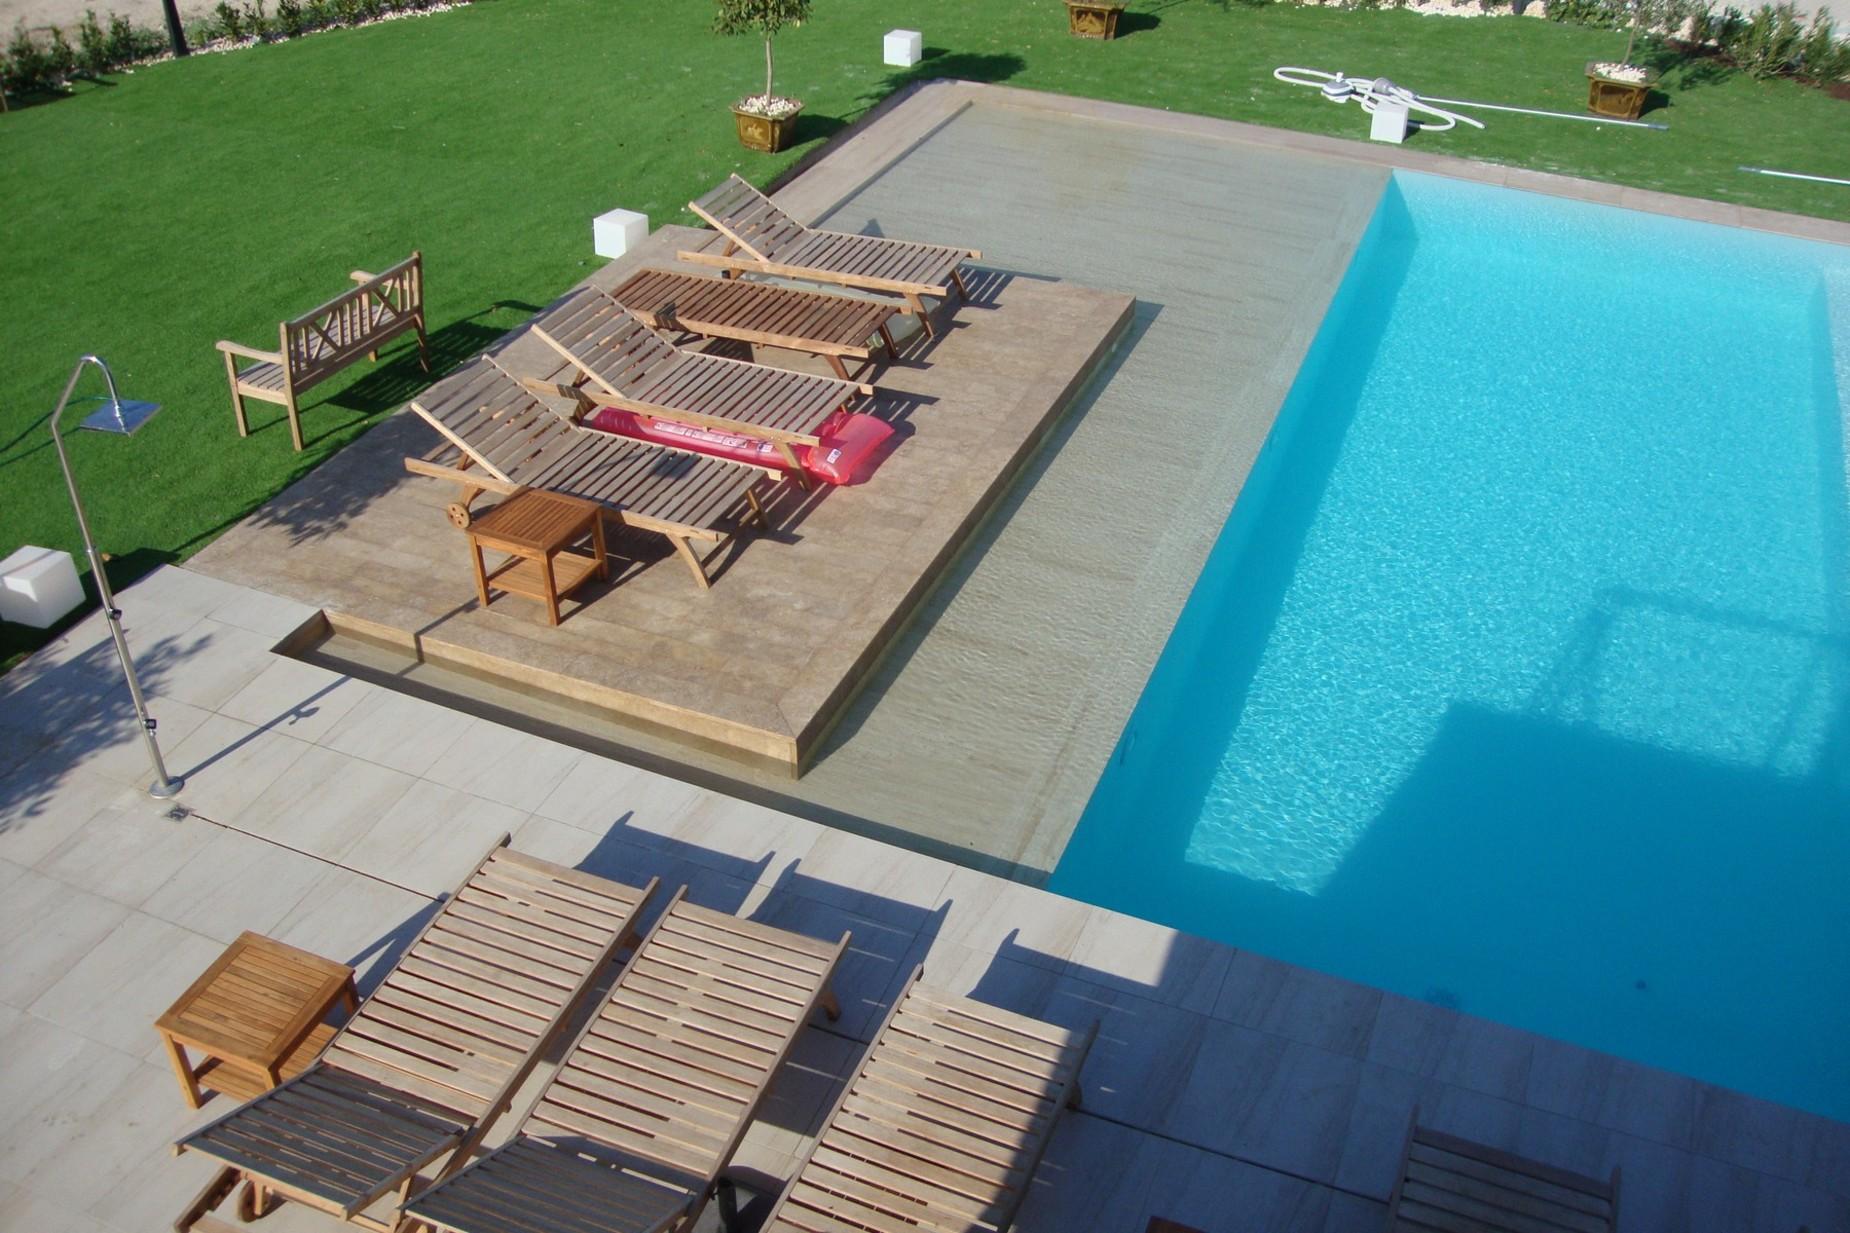 3 bed Villa For Rent in Siggiewi, Siggiewi - thumb 6